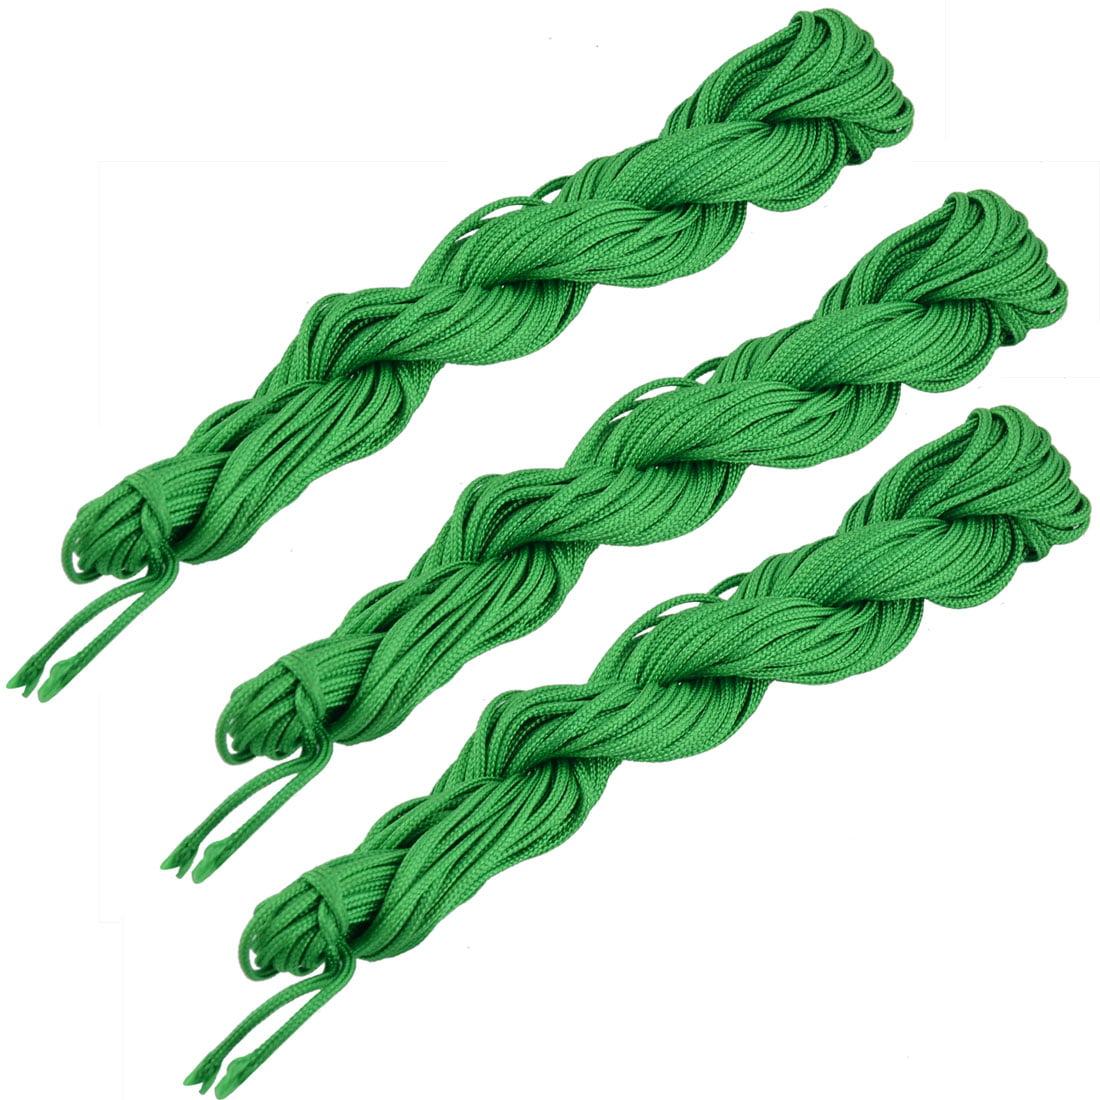 Nylon Handmade Craft DIY Chinese Knot Necklace Cord String Green 16 Yards 3pcs